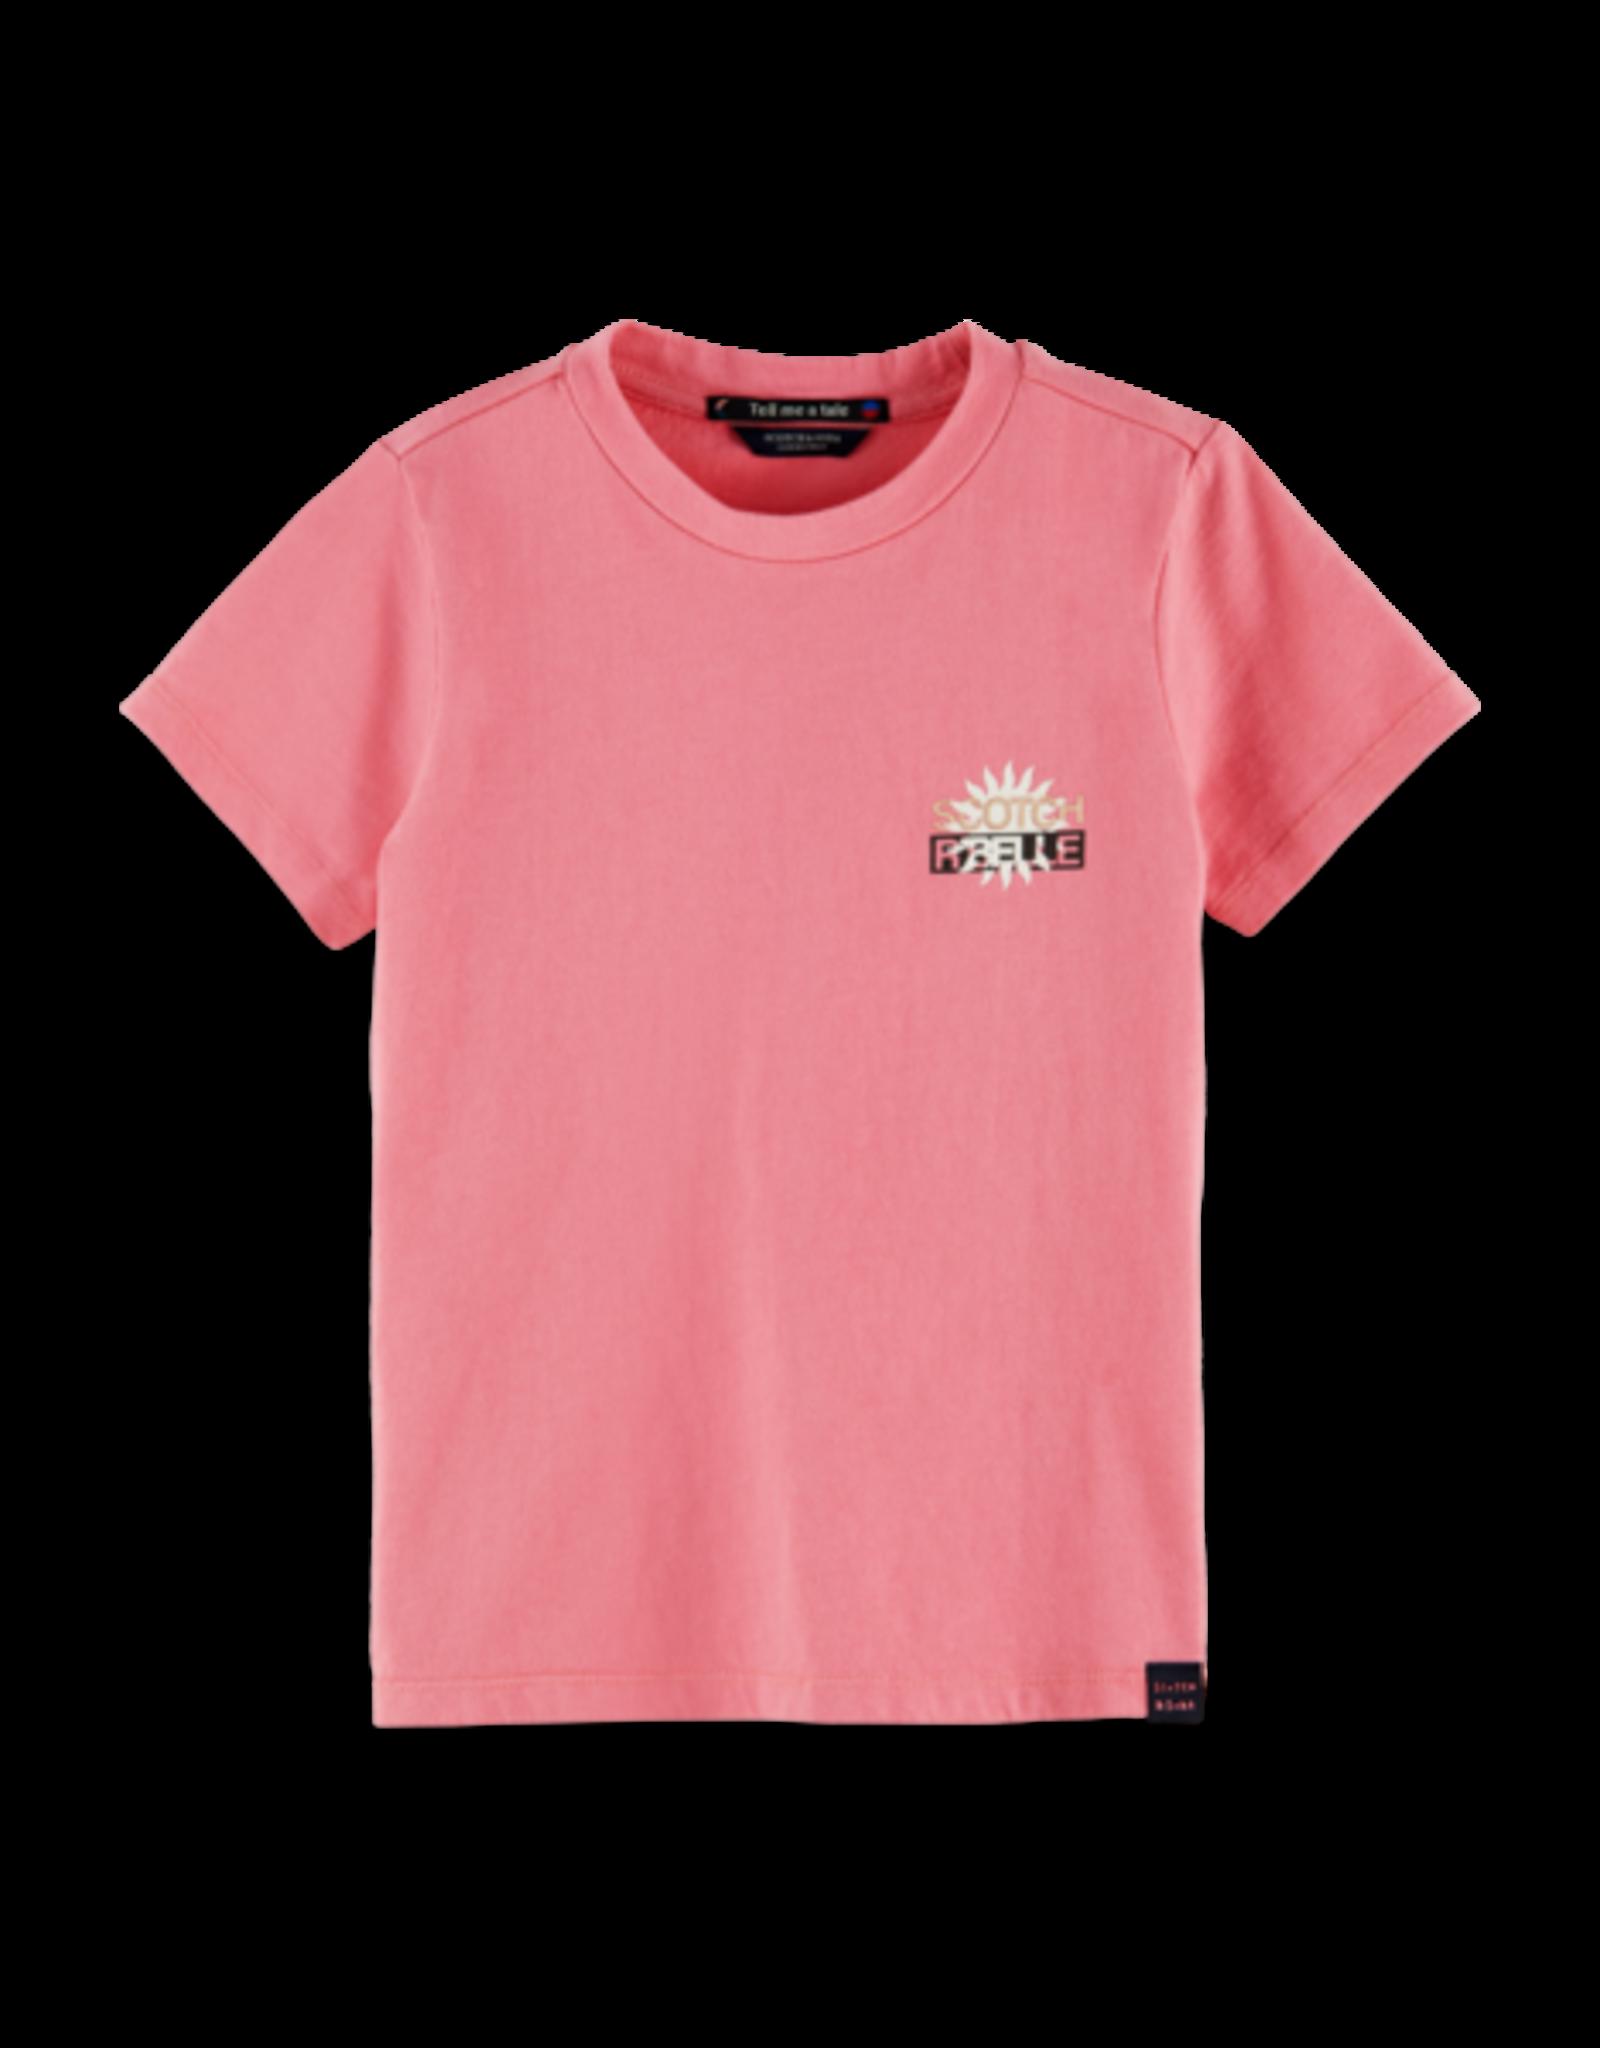 Scotch&Soda R'belle SS21 160215 SS tee pink